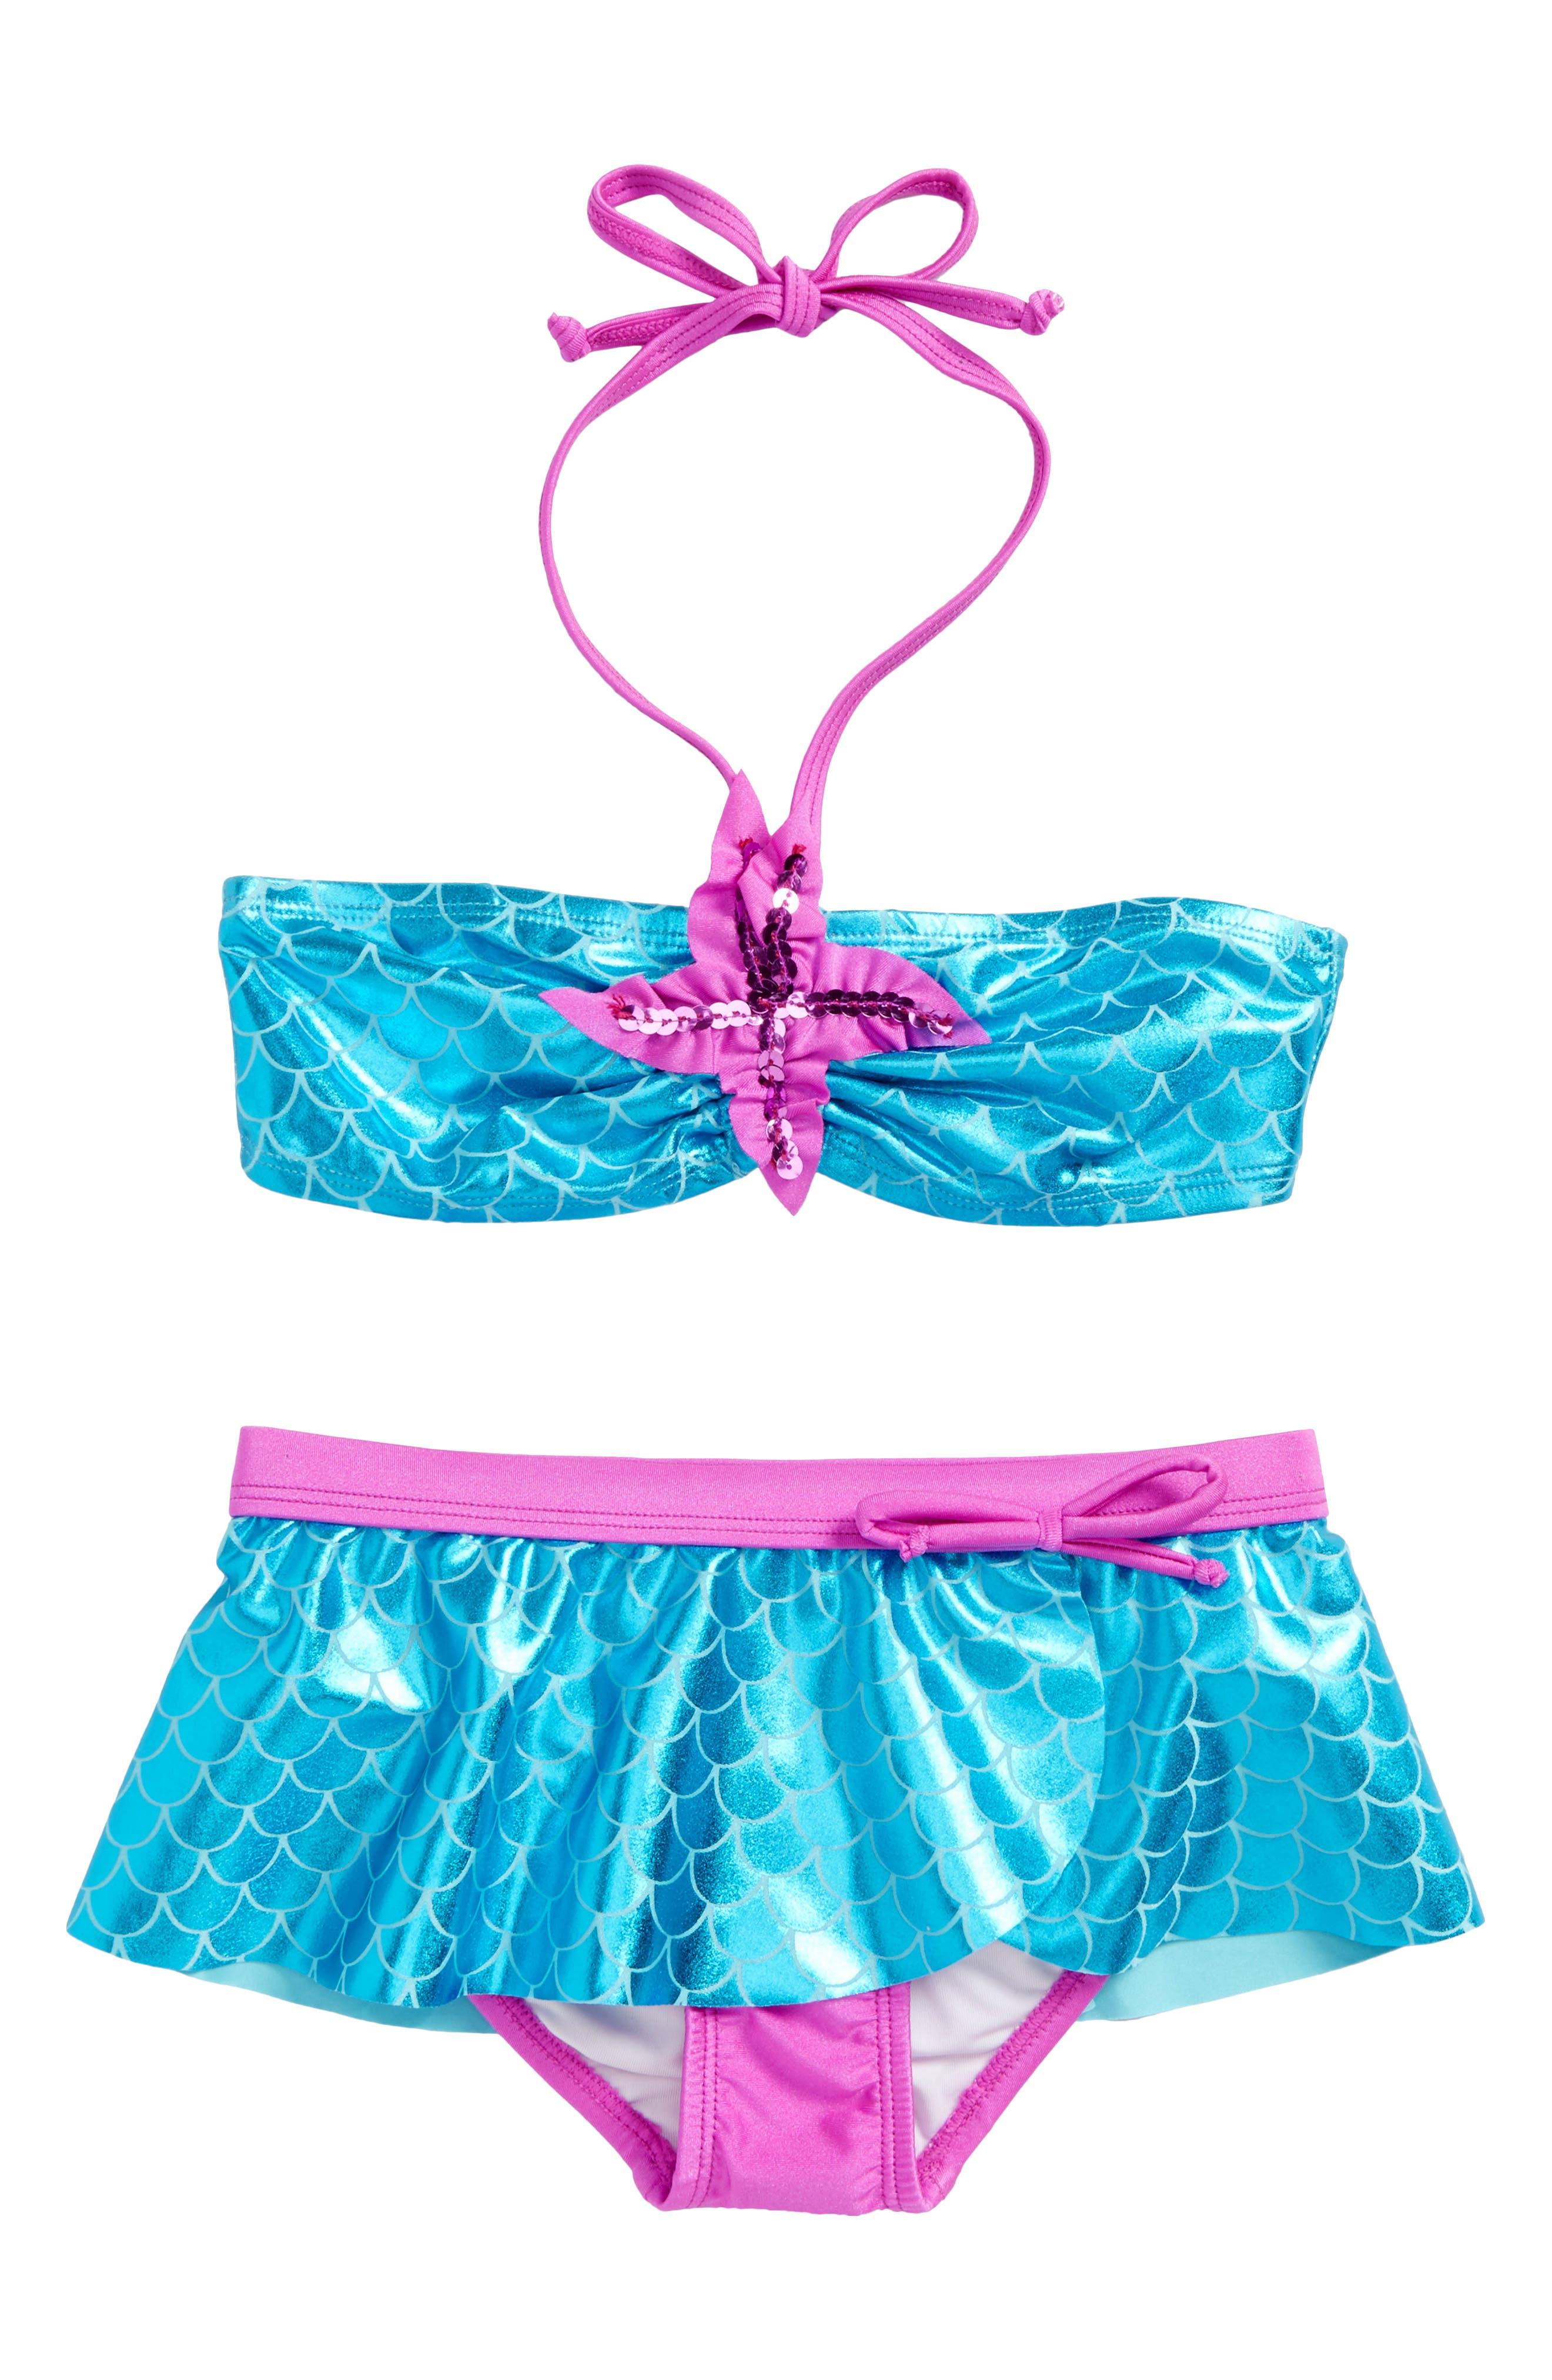 Main Image - Love U Lots Mermaid Two-Piece Bikini Swimsuit (Toddler Girls & Little Girls)